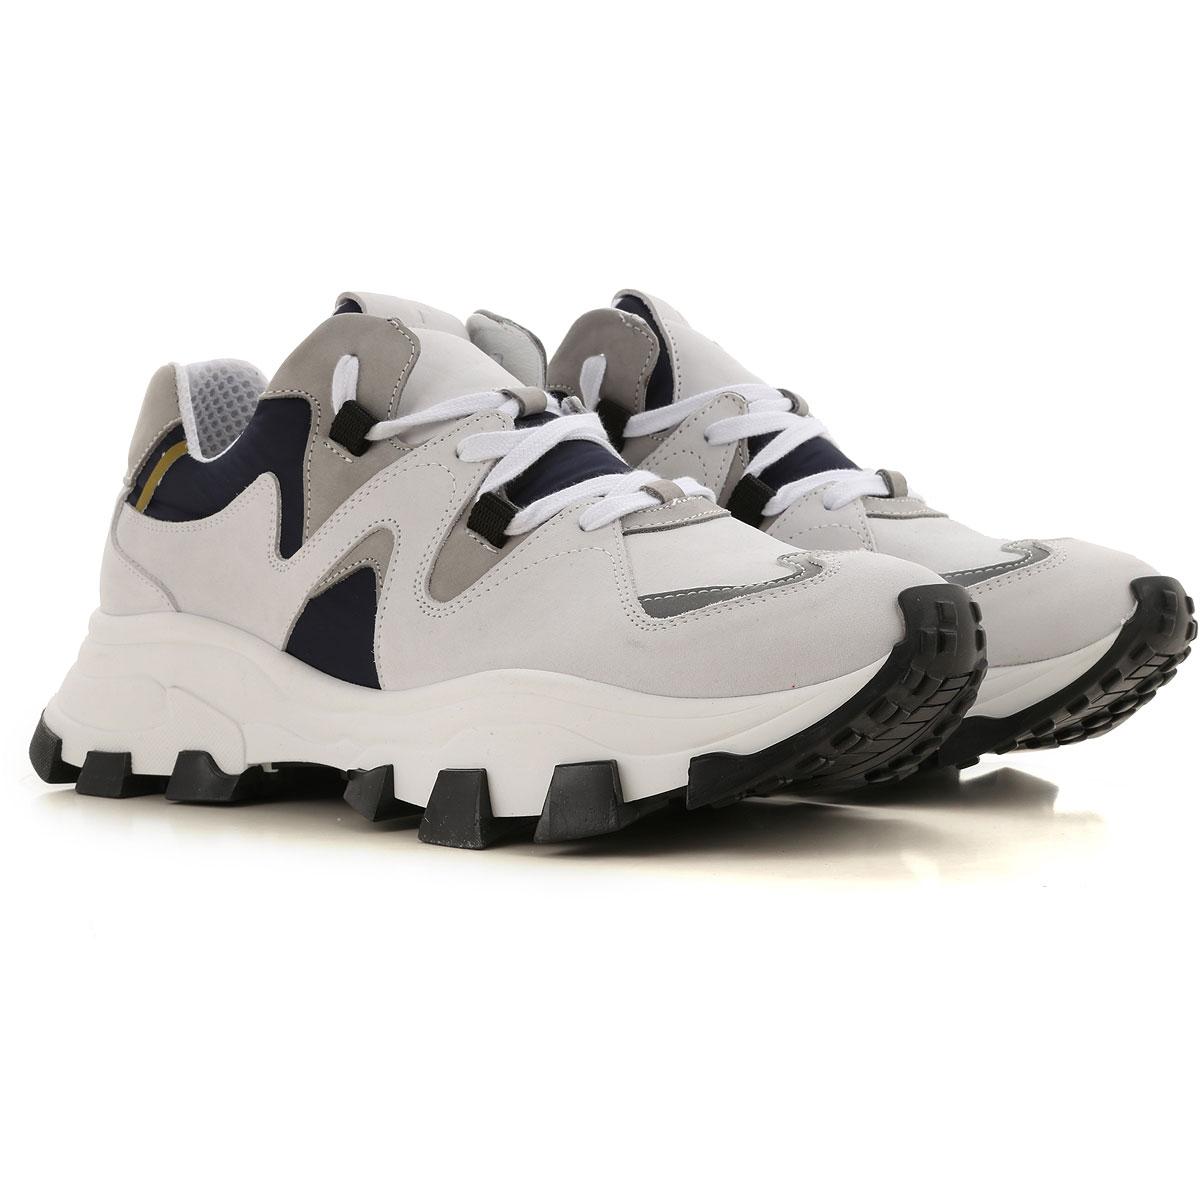 Cinzia Araia Sneaker Homme Pas cher en Soldes, Blanc, Cuir, 2019, 40 41 42 43